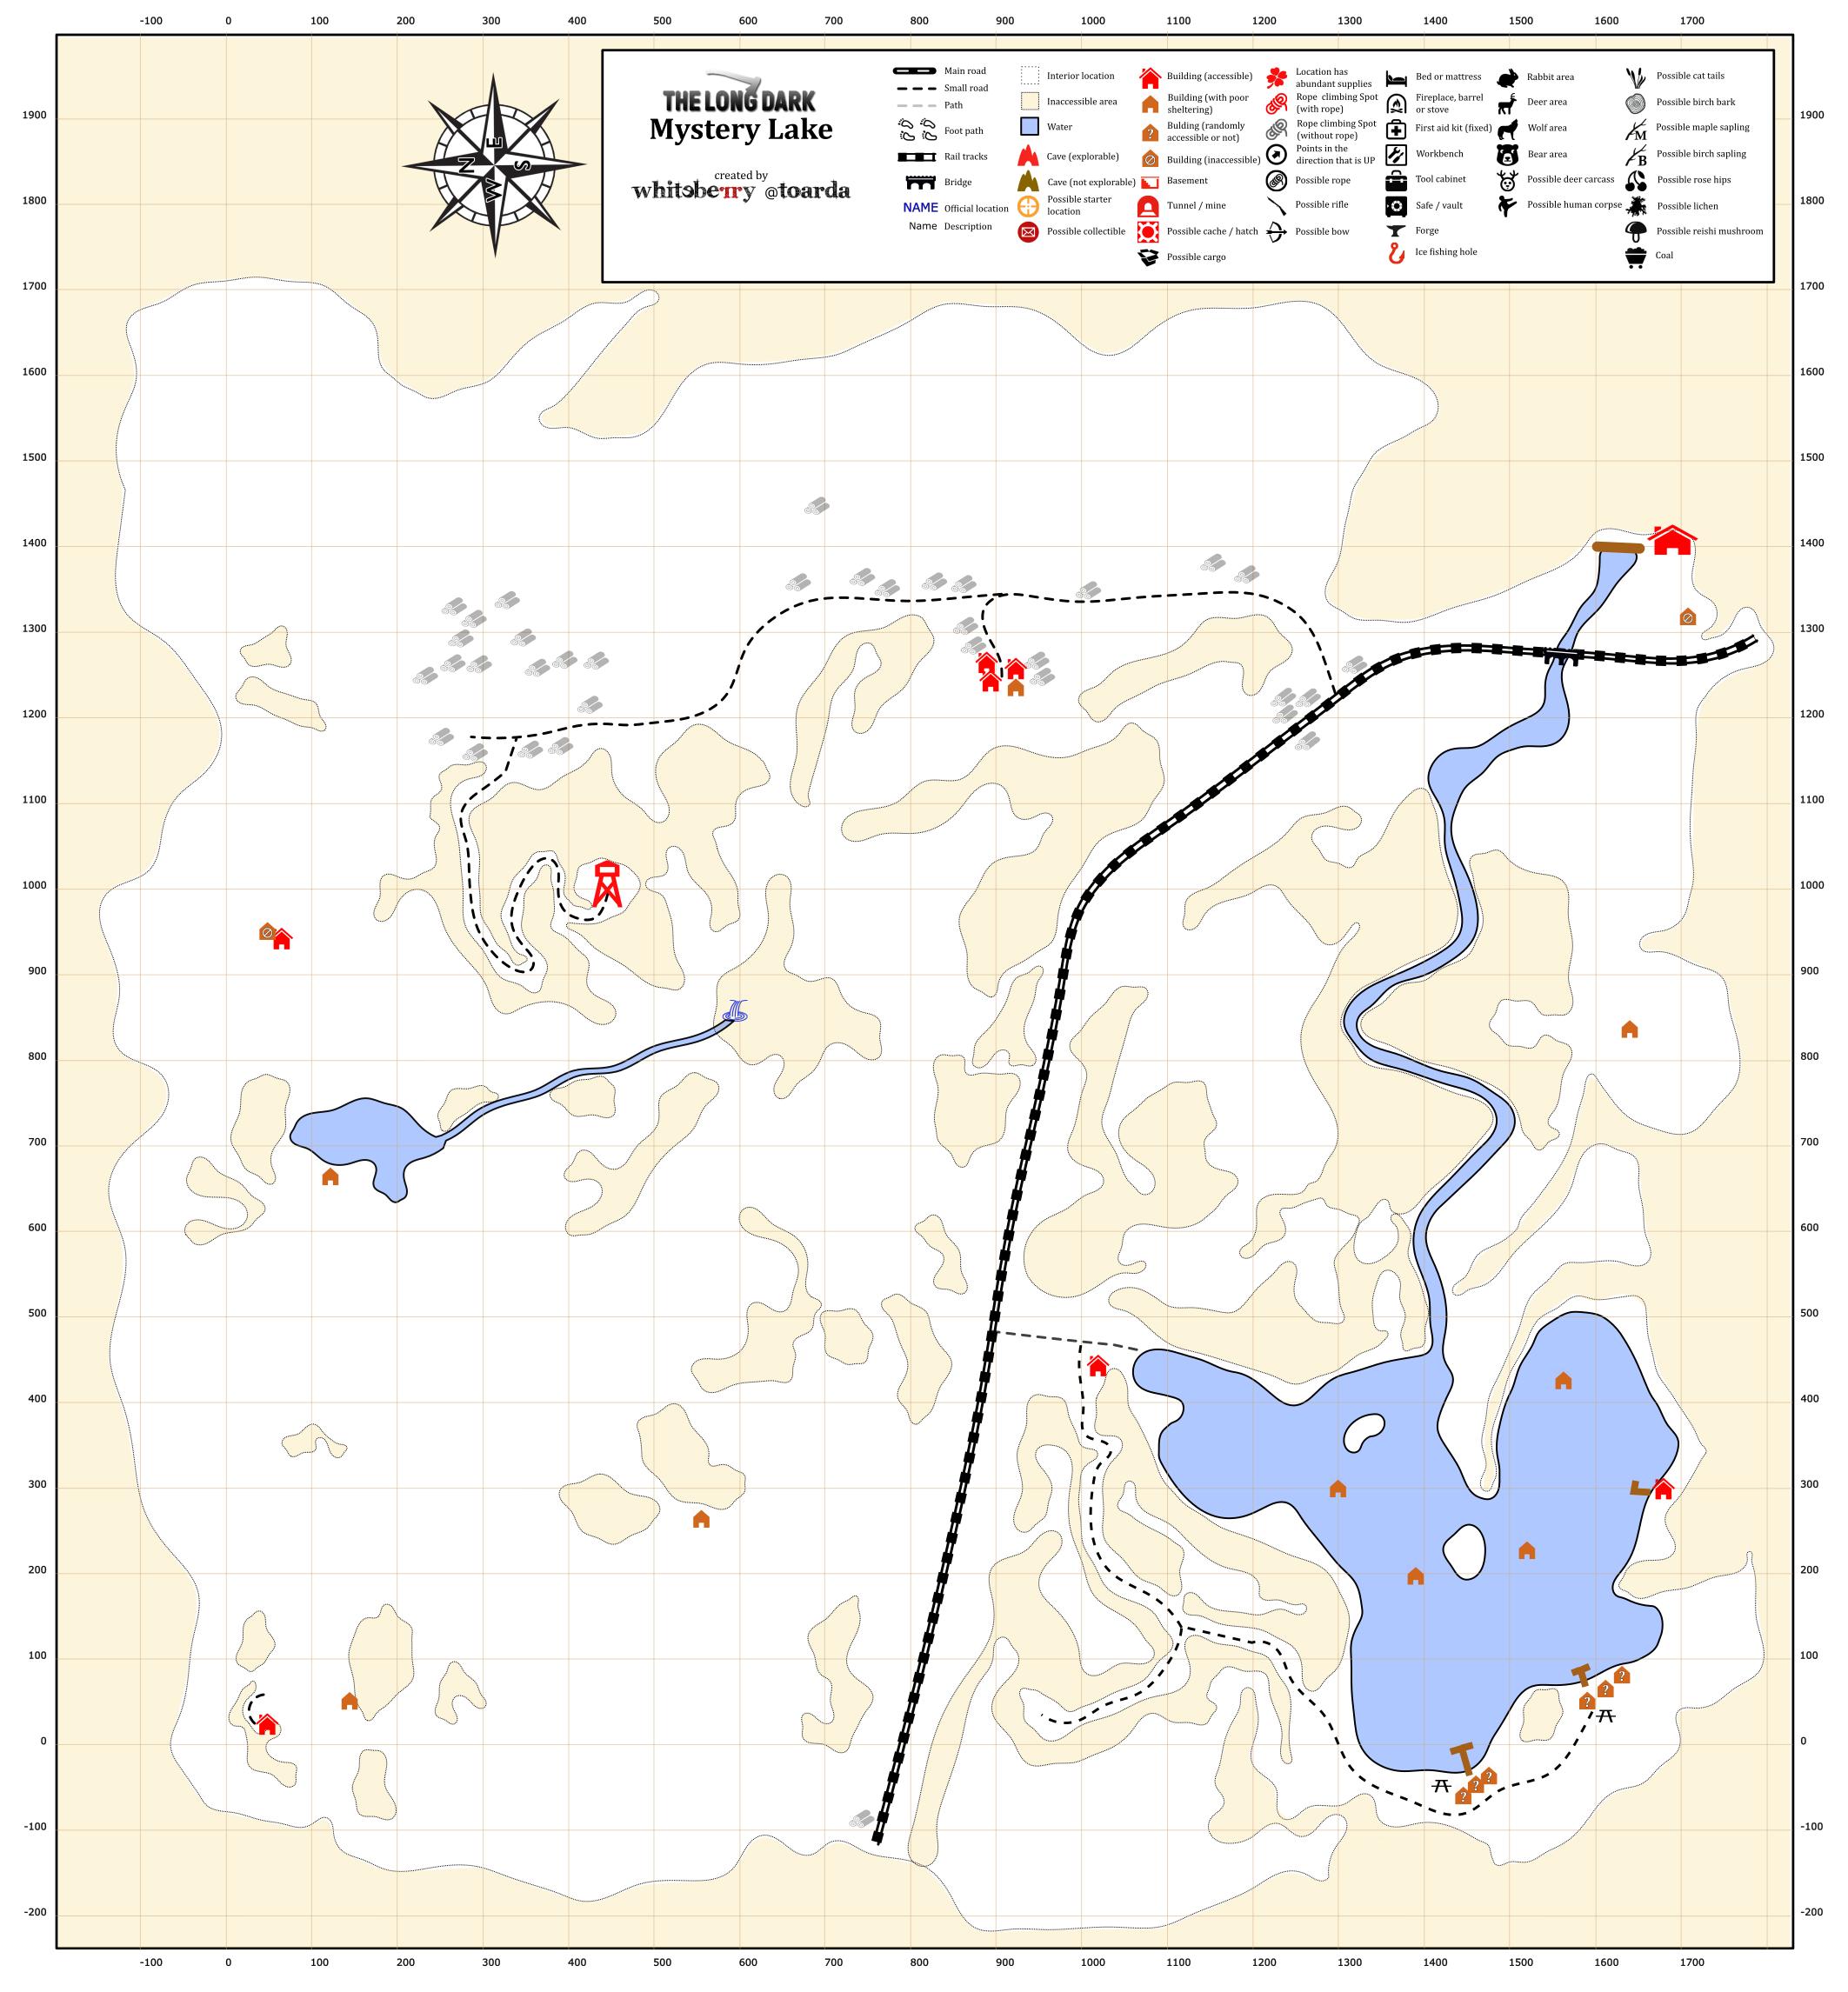 Worksheet. Steam Community  Guide  Detailed Region Maps  The Long Dark